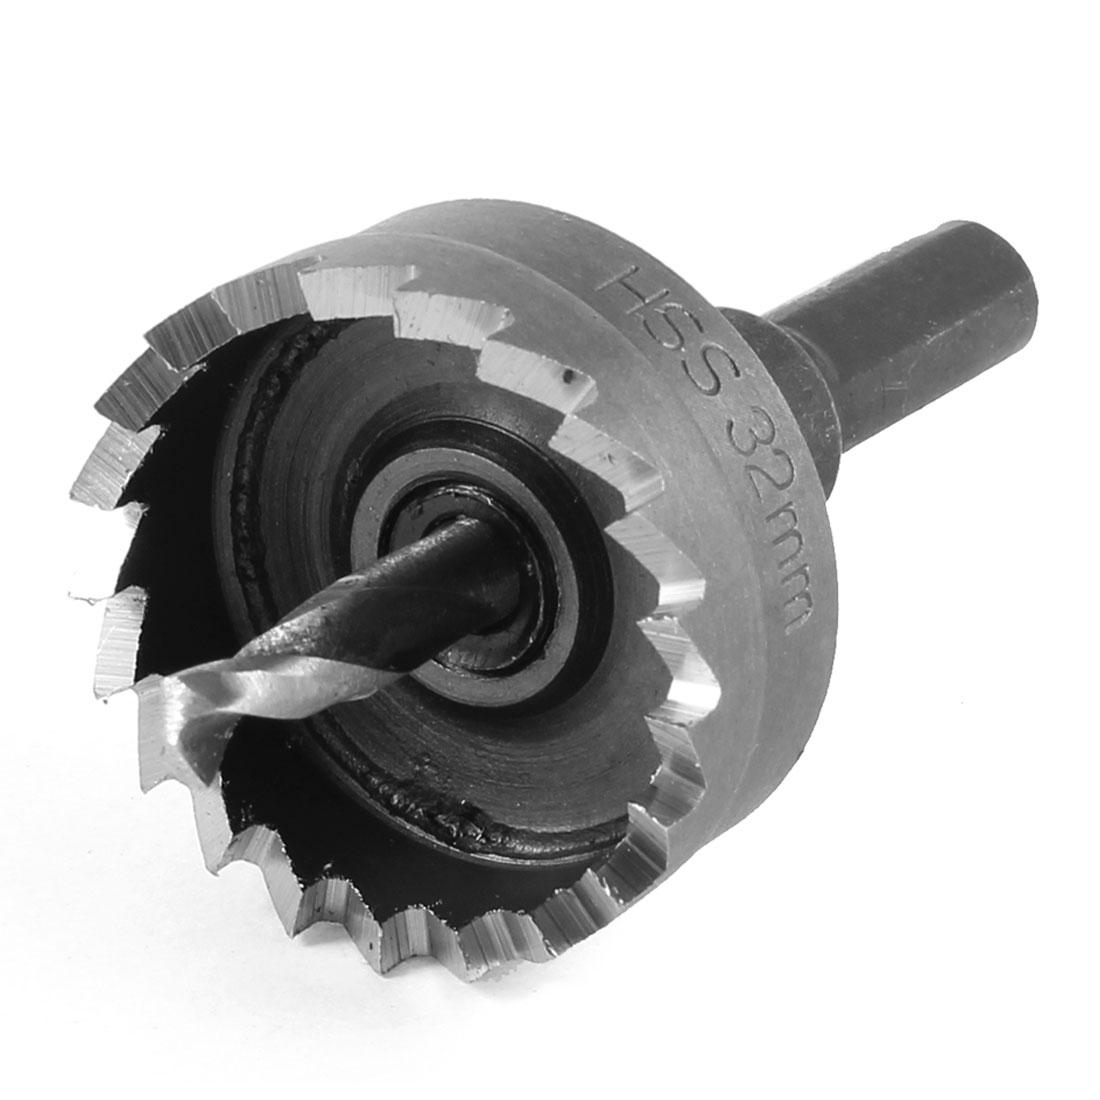 HSS Triangle Shank 32mm Dia Iron Cutting Hole Saw Twist Drill Bit 65mm Long